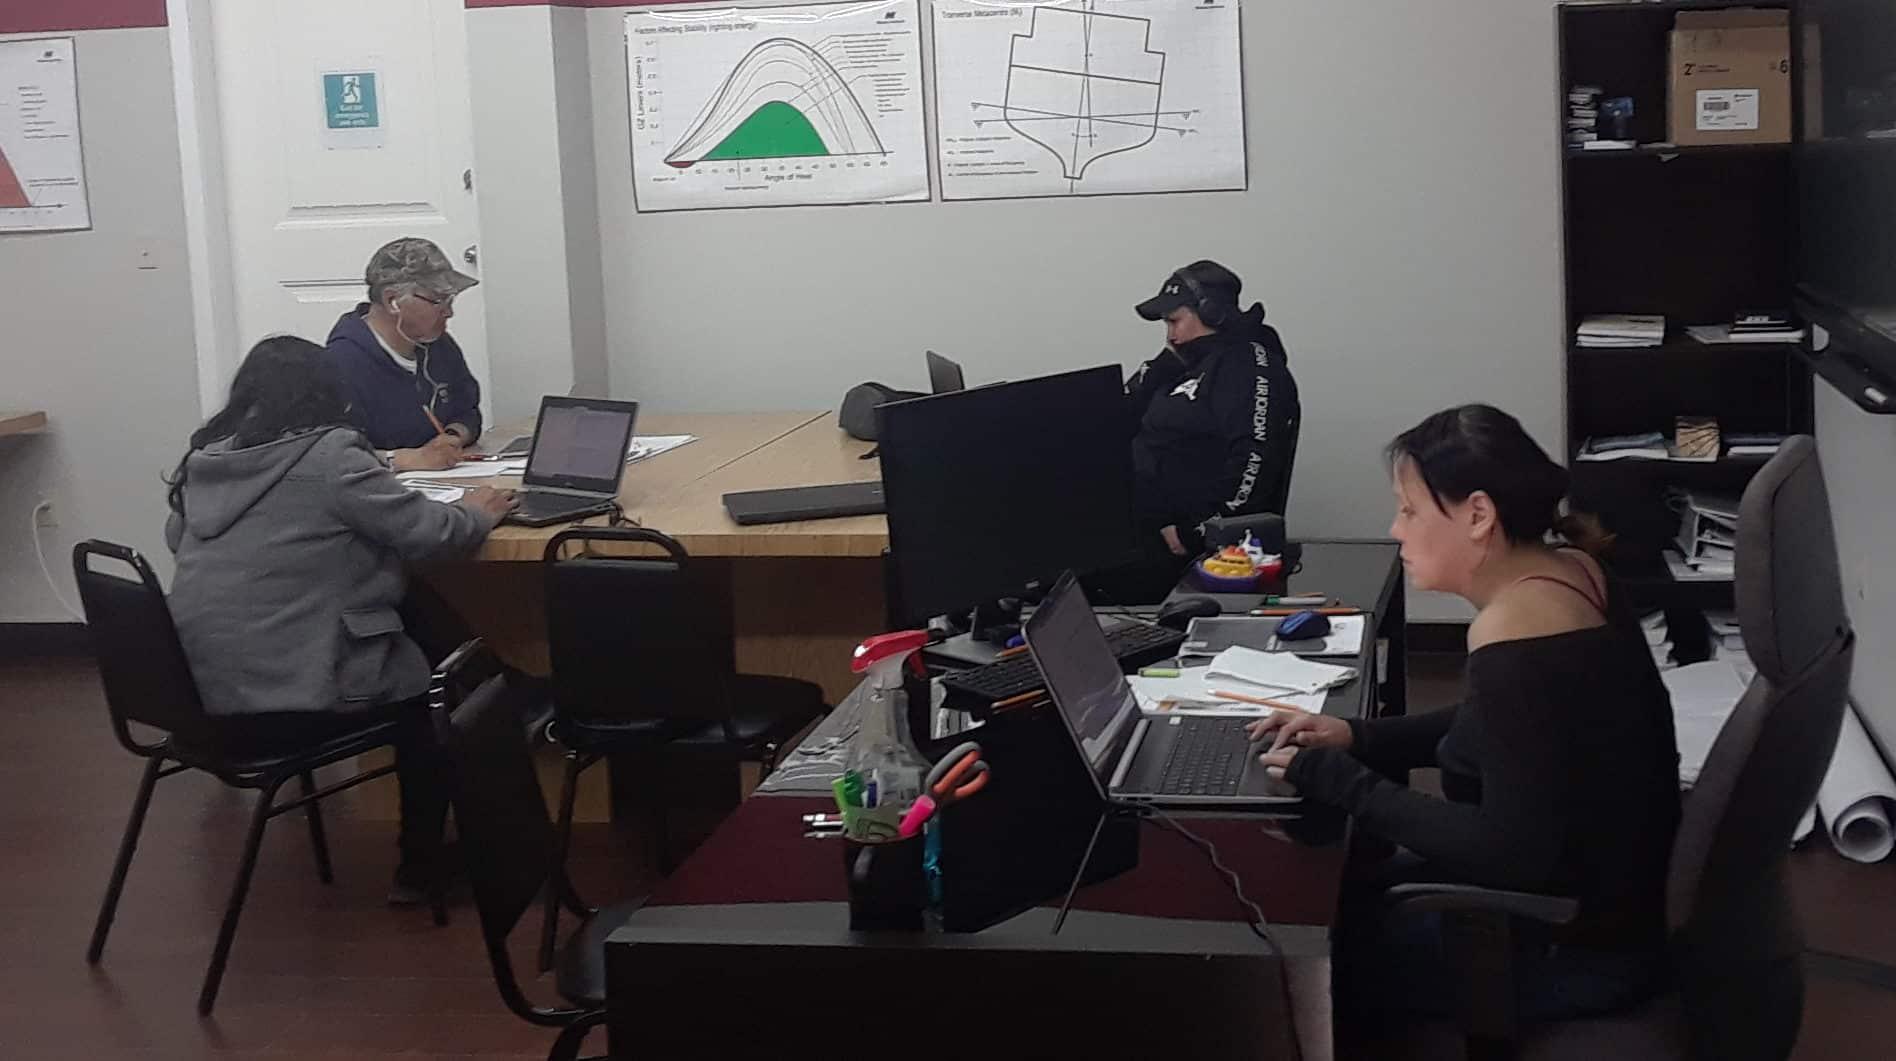 Qikiqtani computers for digital skills development